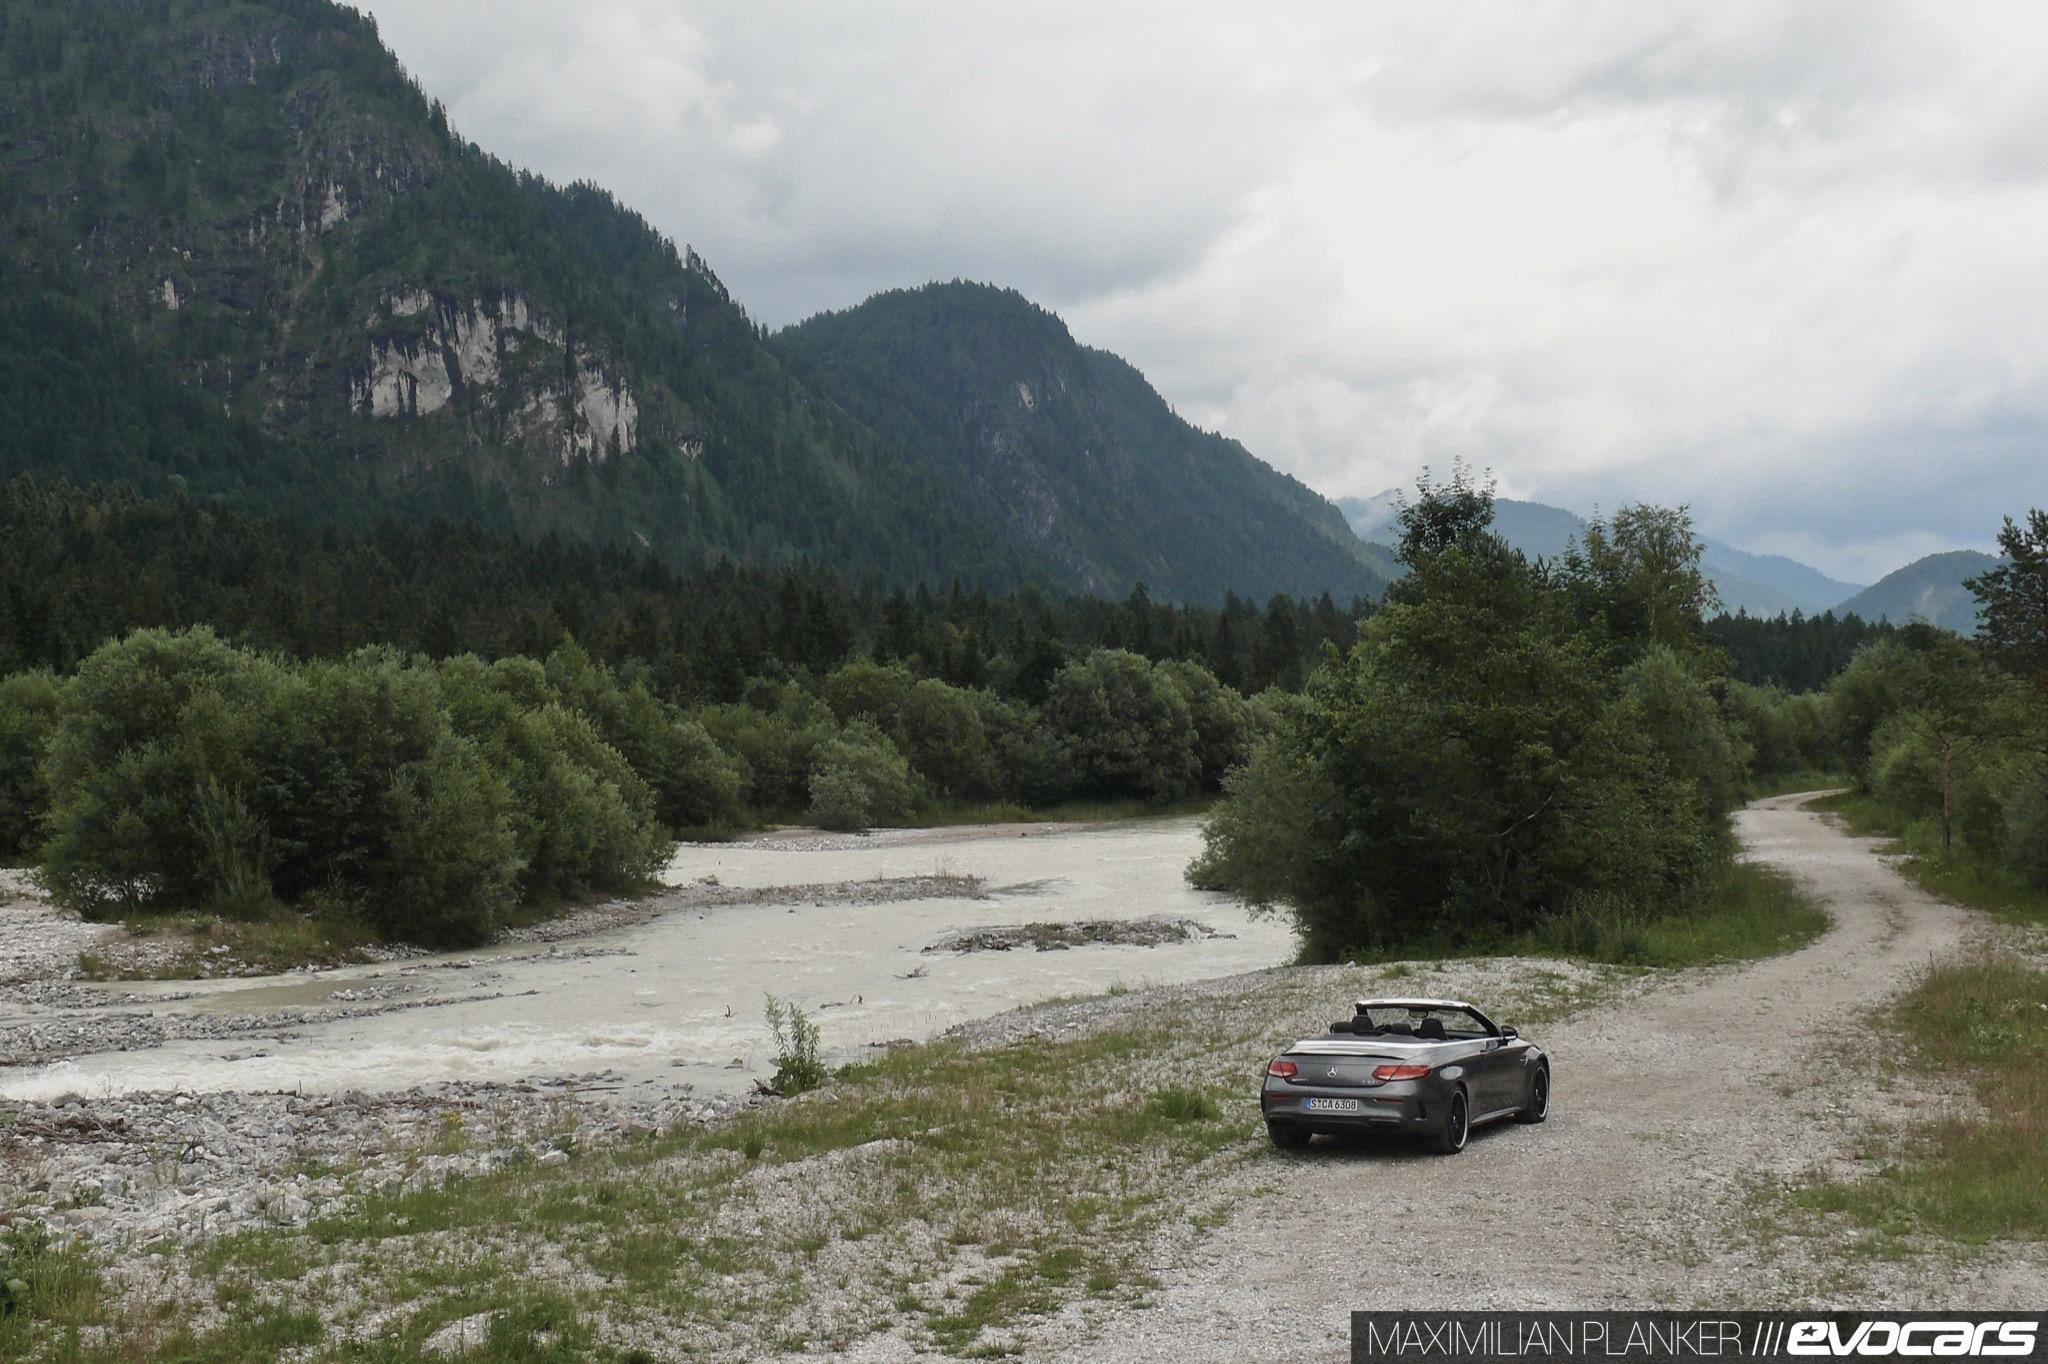 Das Rote Dach Mercedes Amg C 63 S Cabriolet Im Test